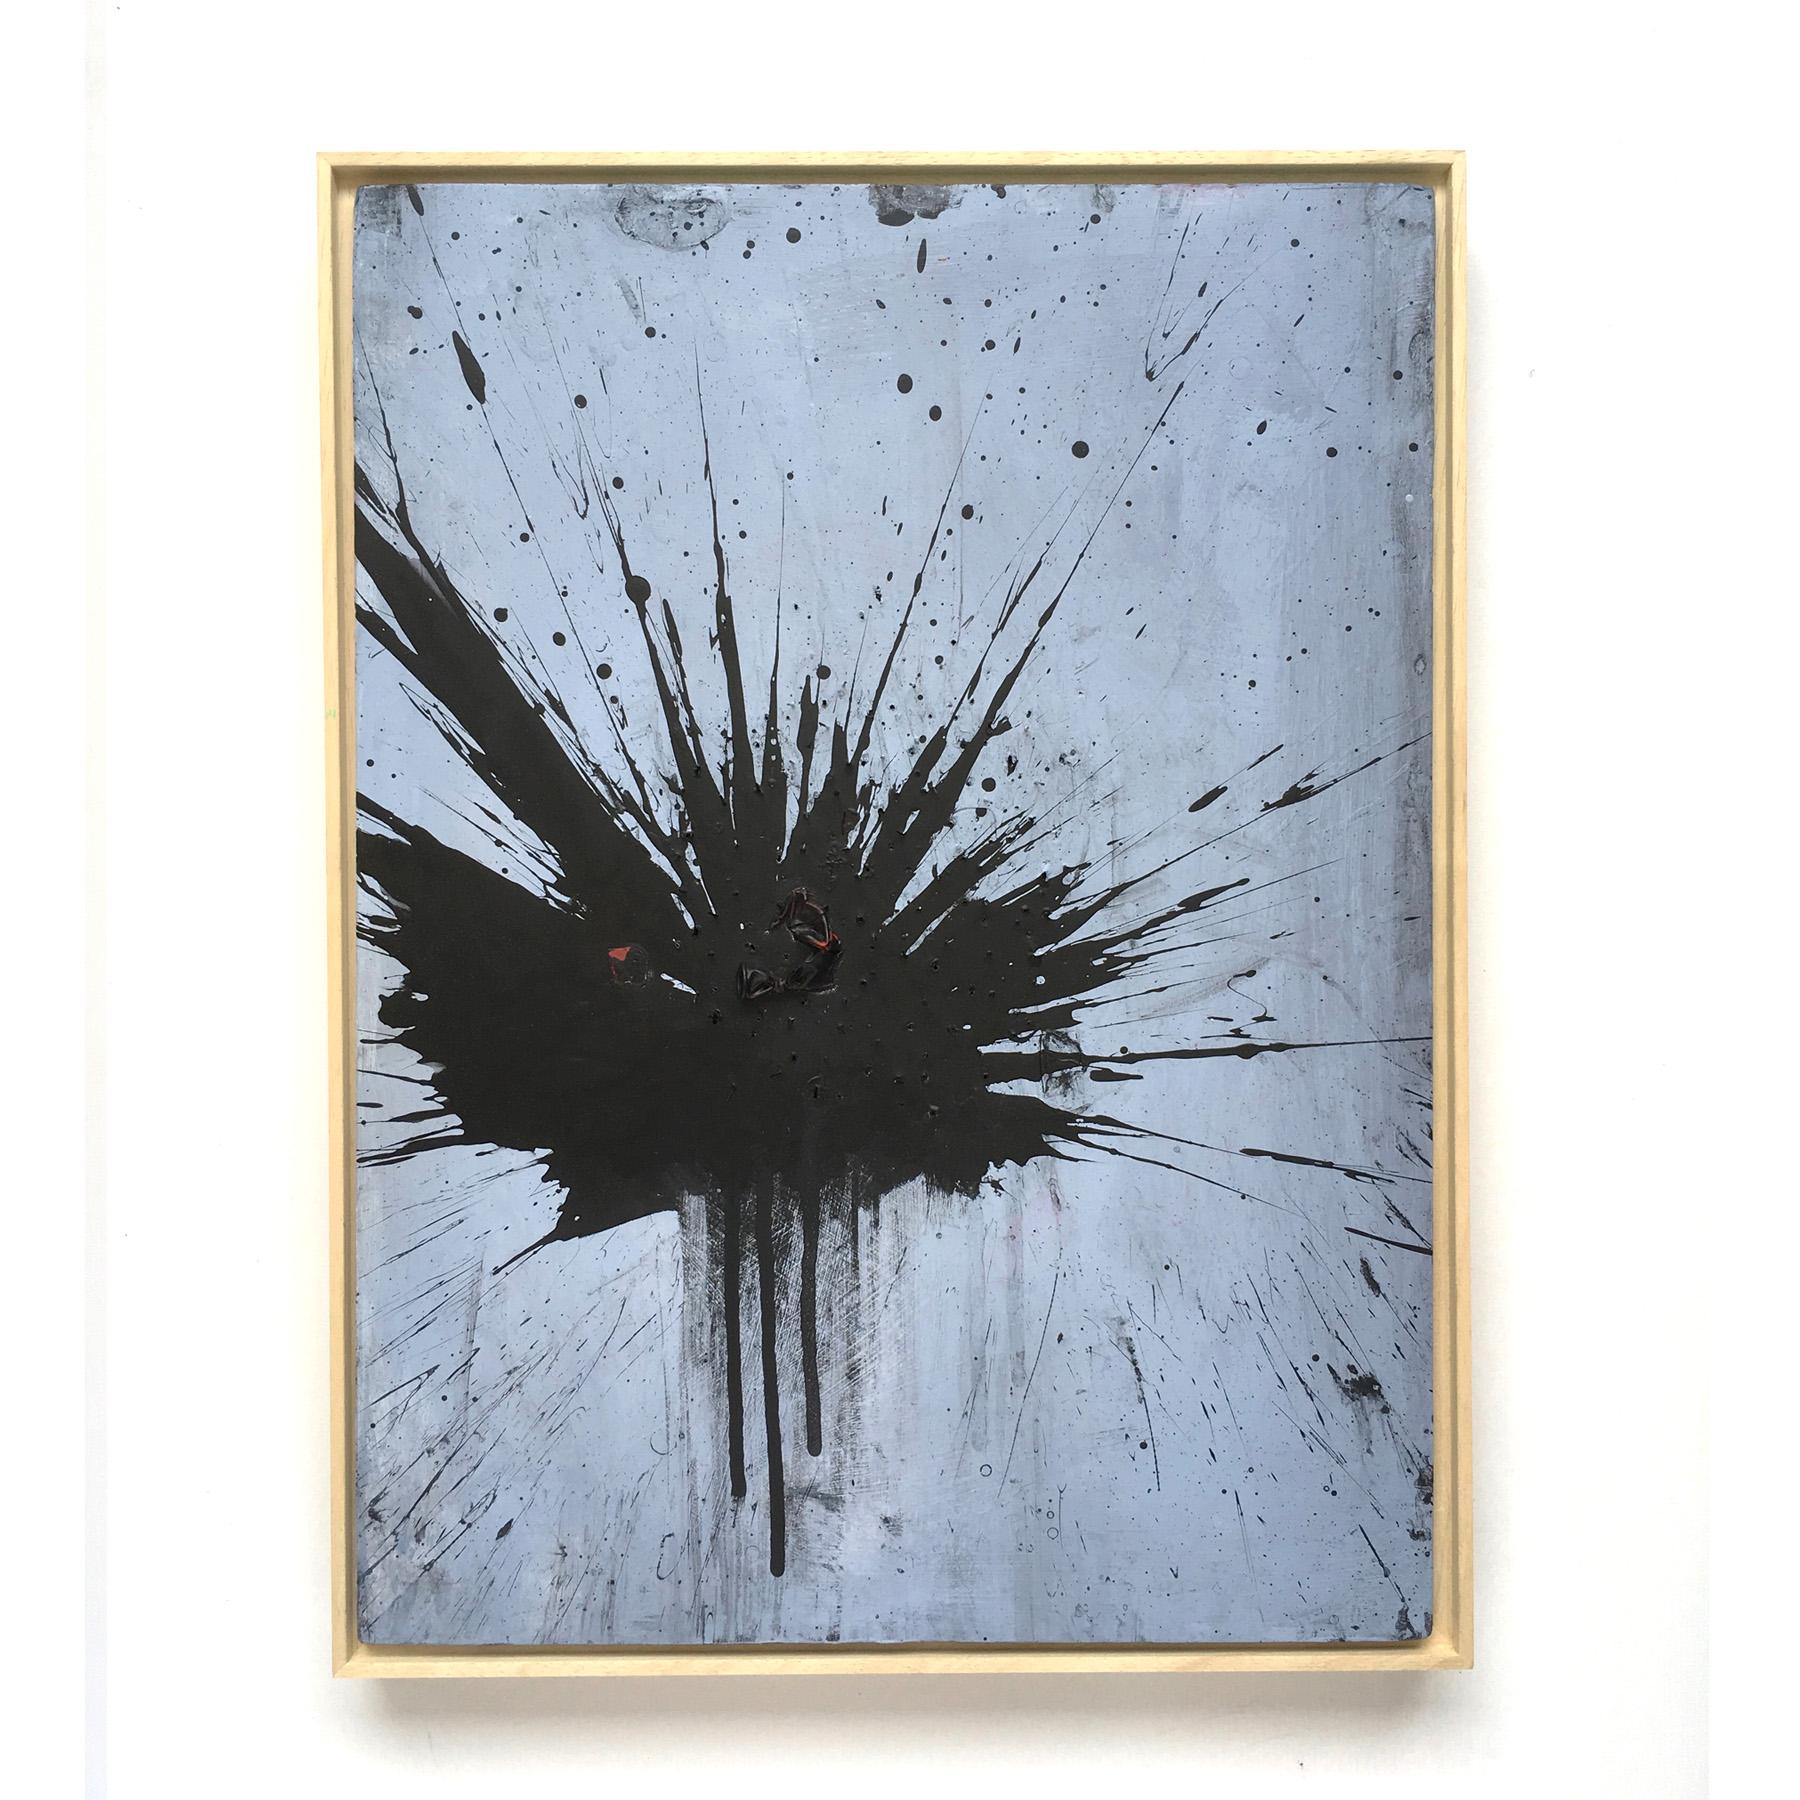 Black Firework Painting 17.09.19